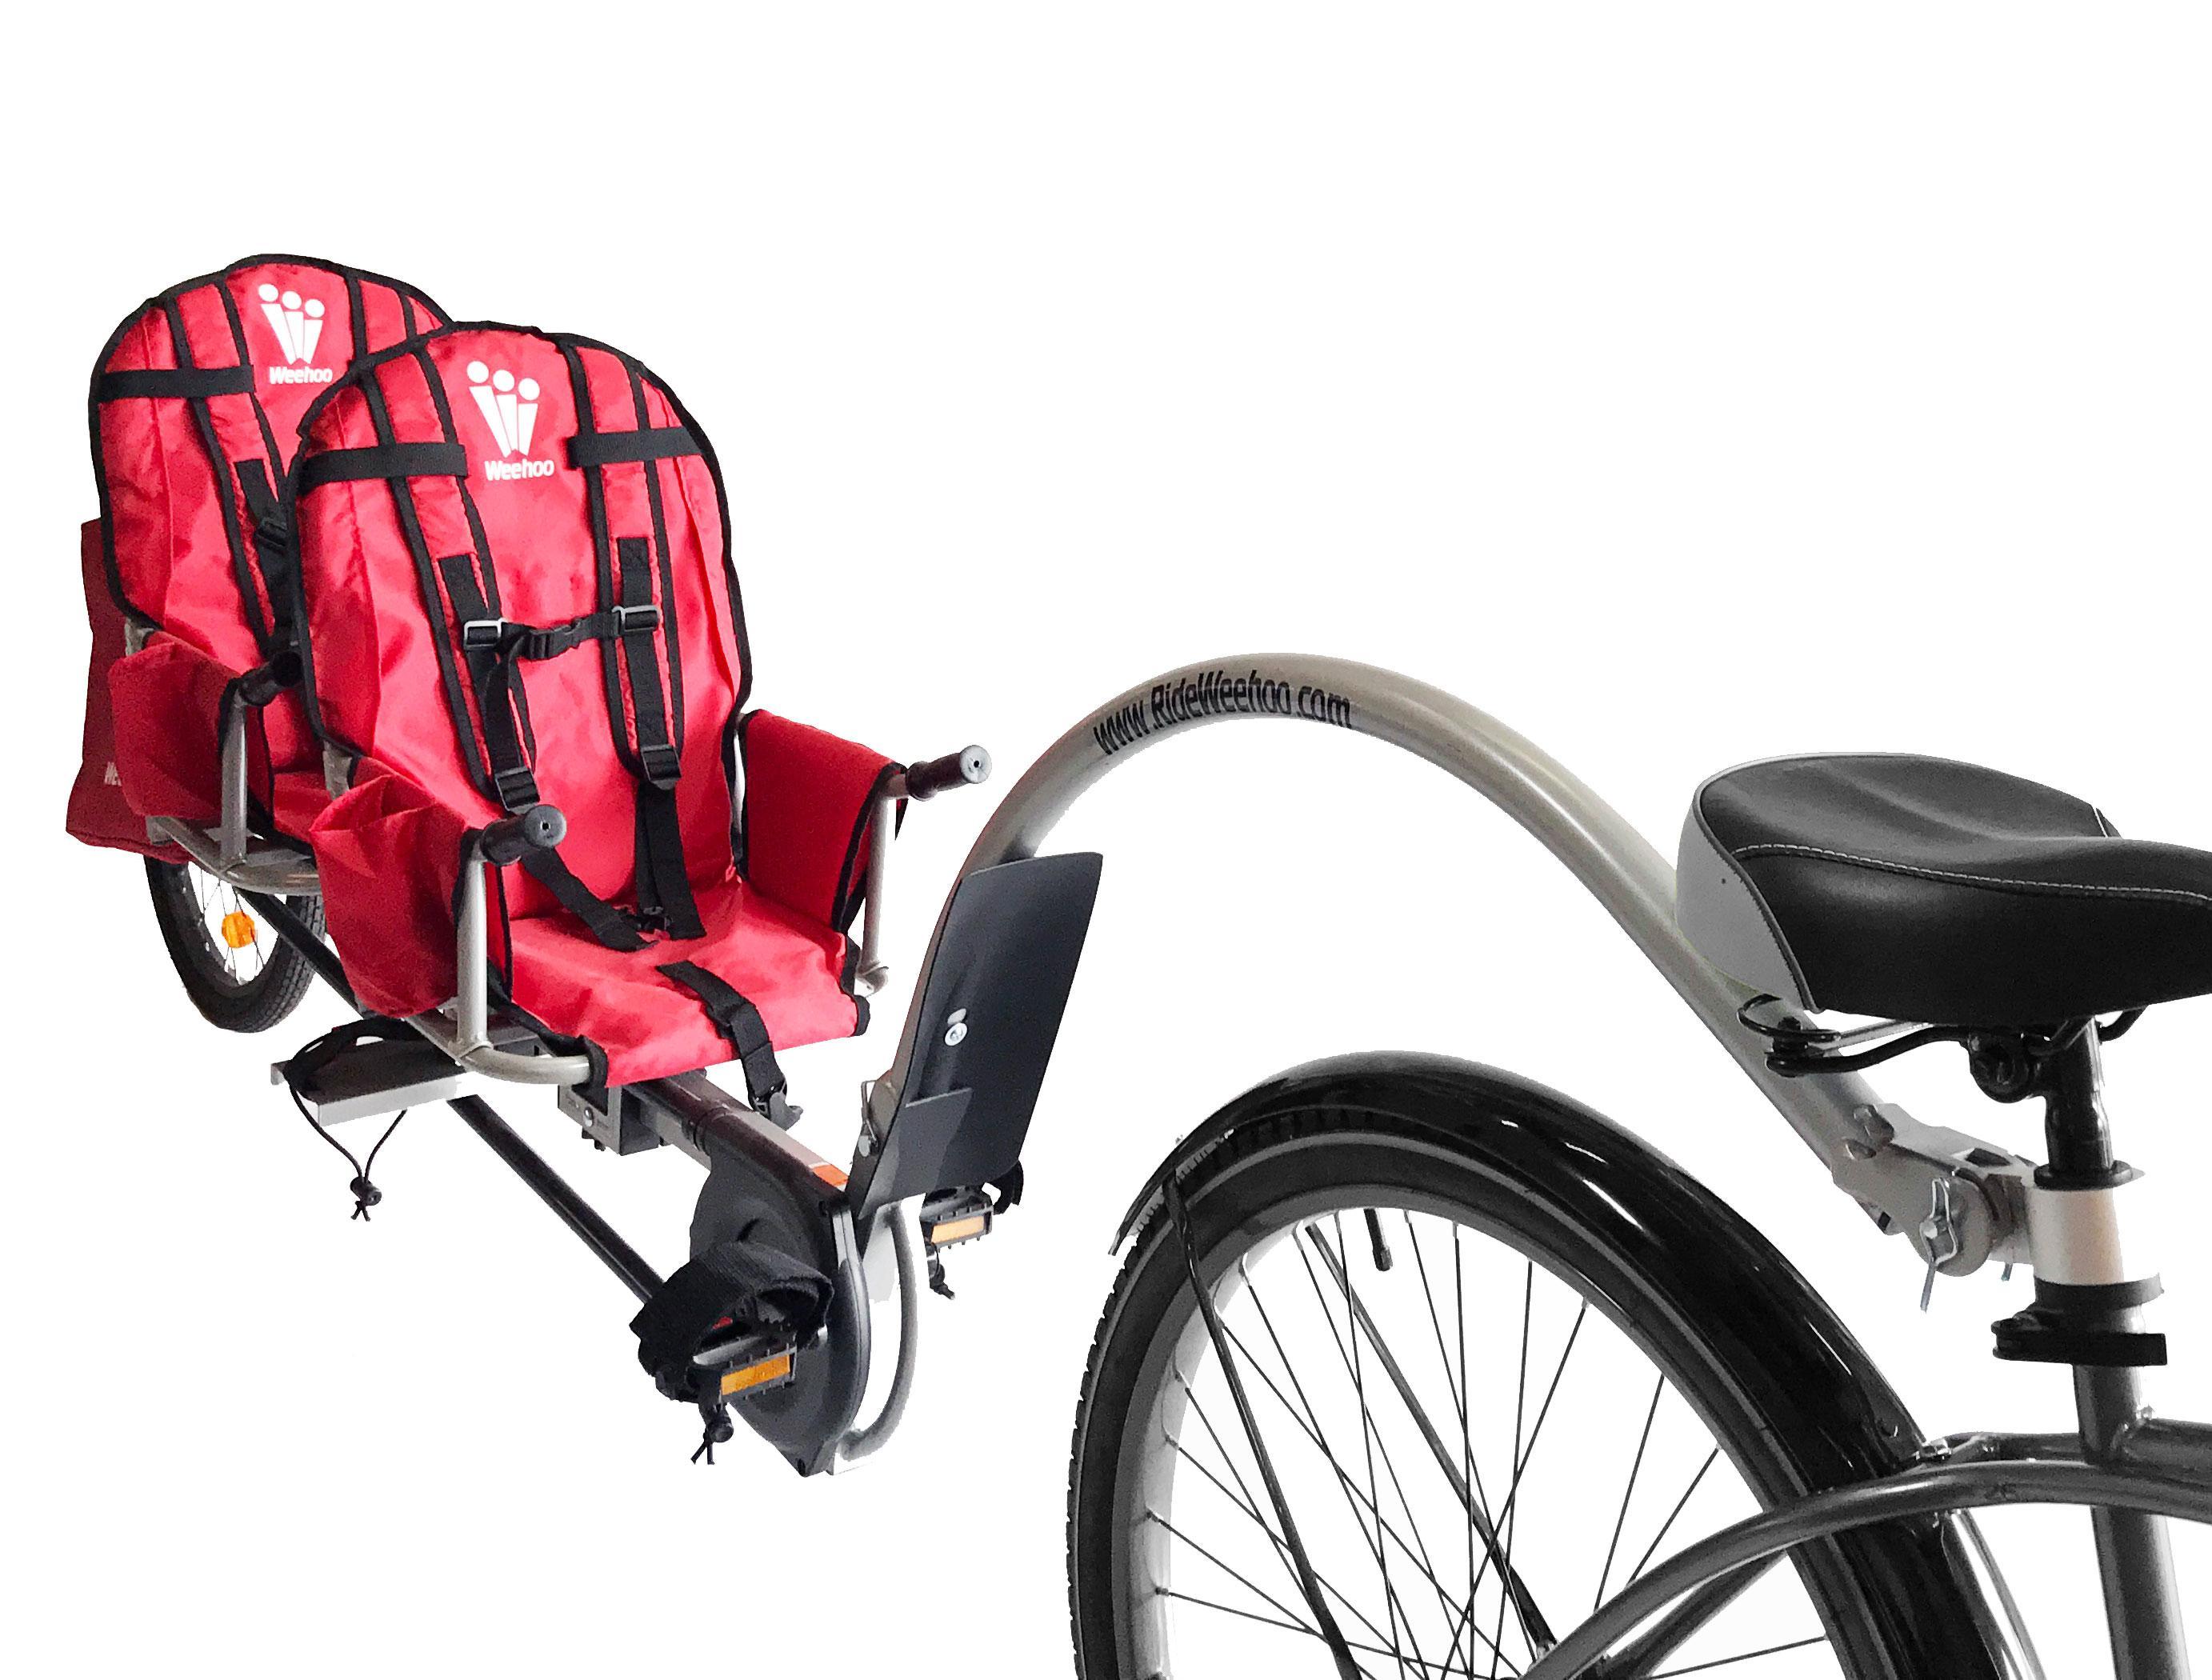 Amazon.com : Weehoo 2-Bike Trailer : Sports & Outdoors